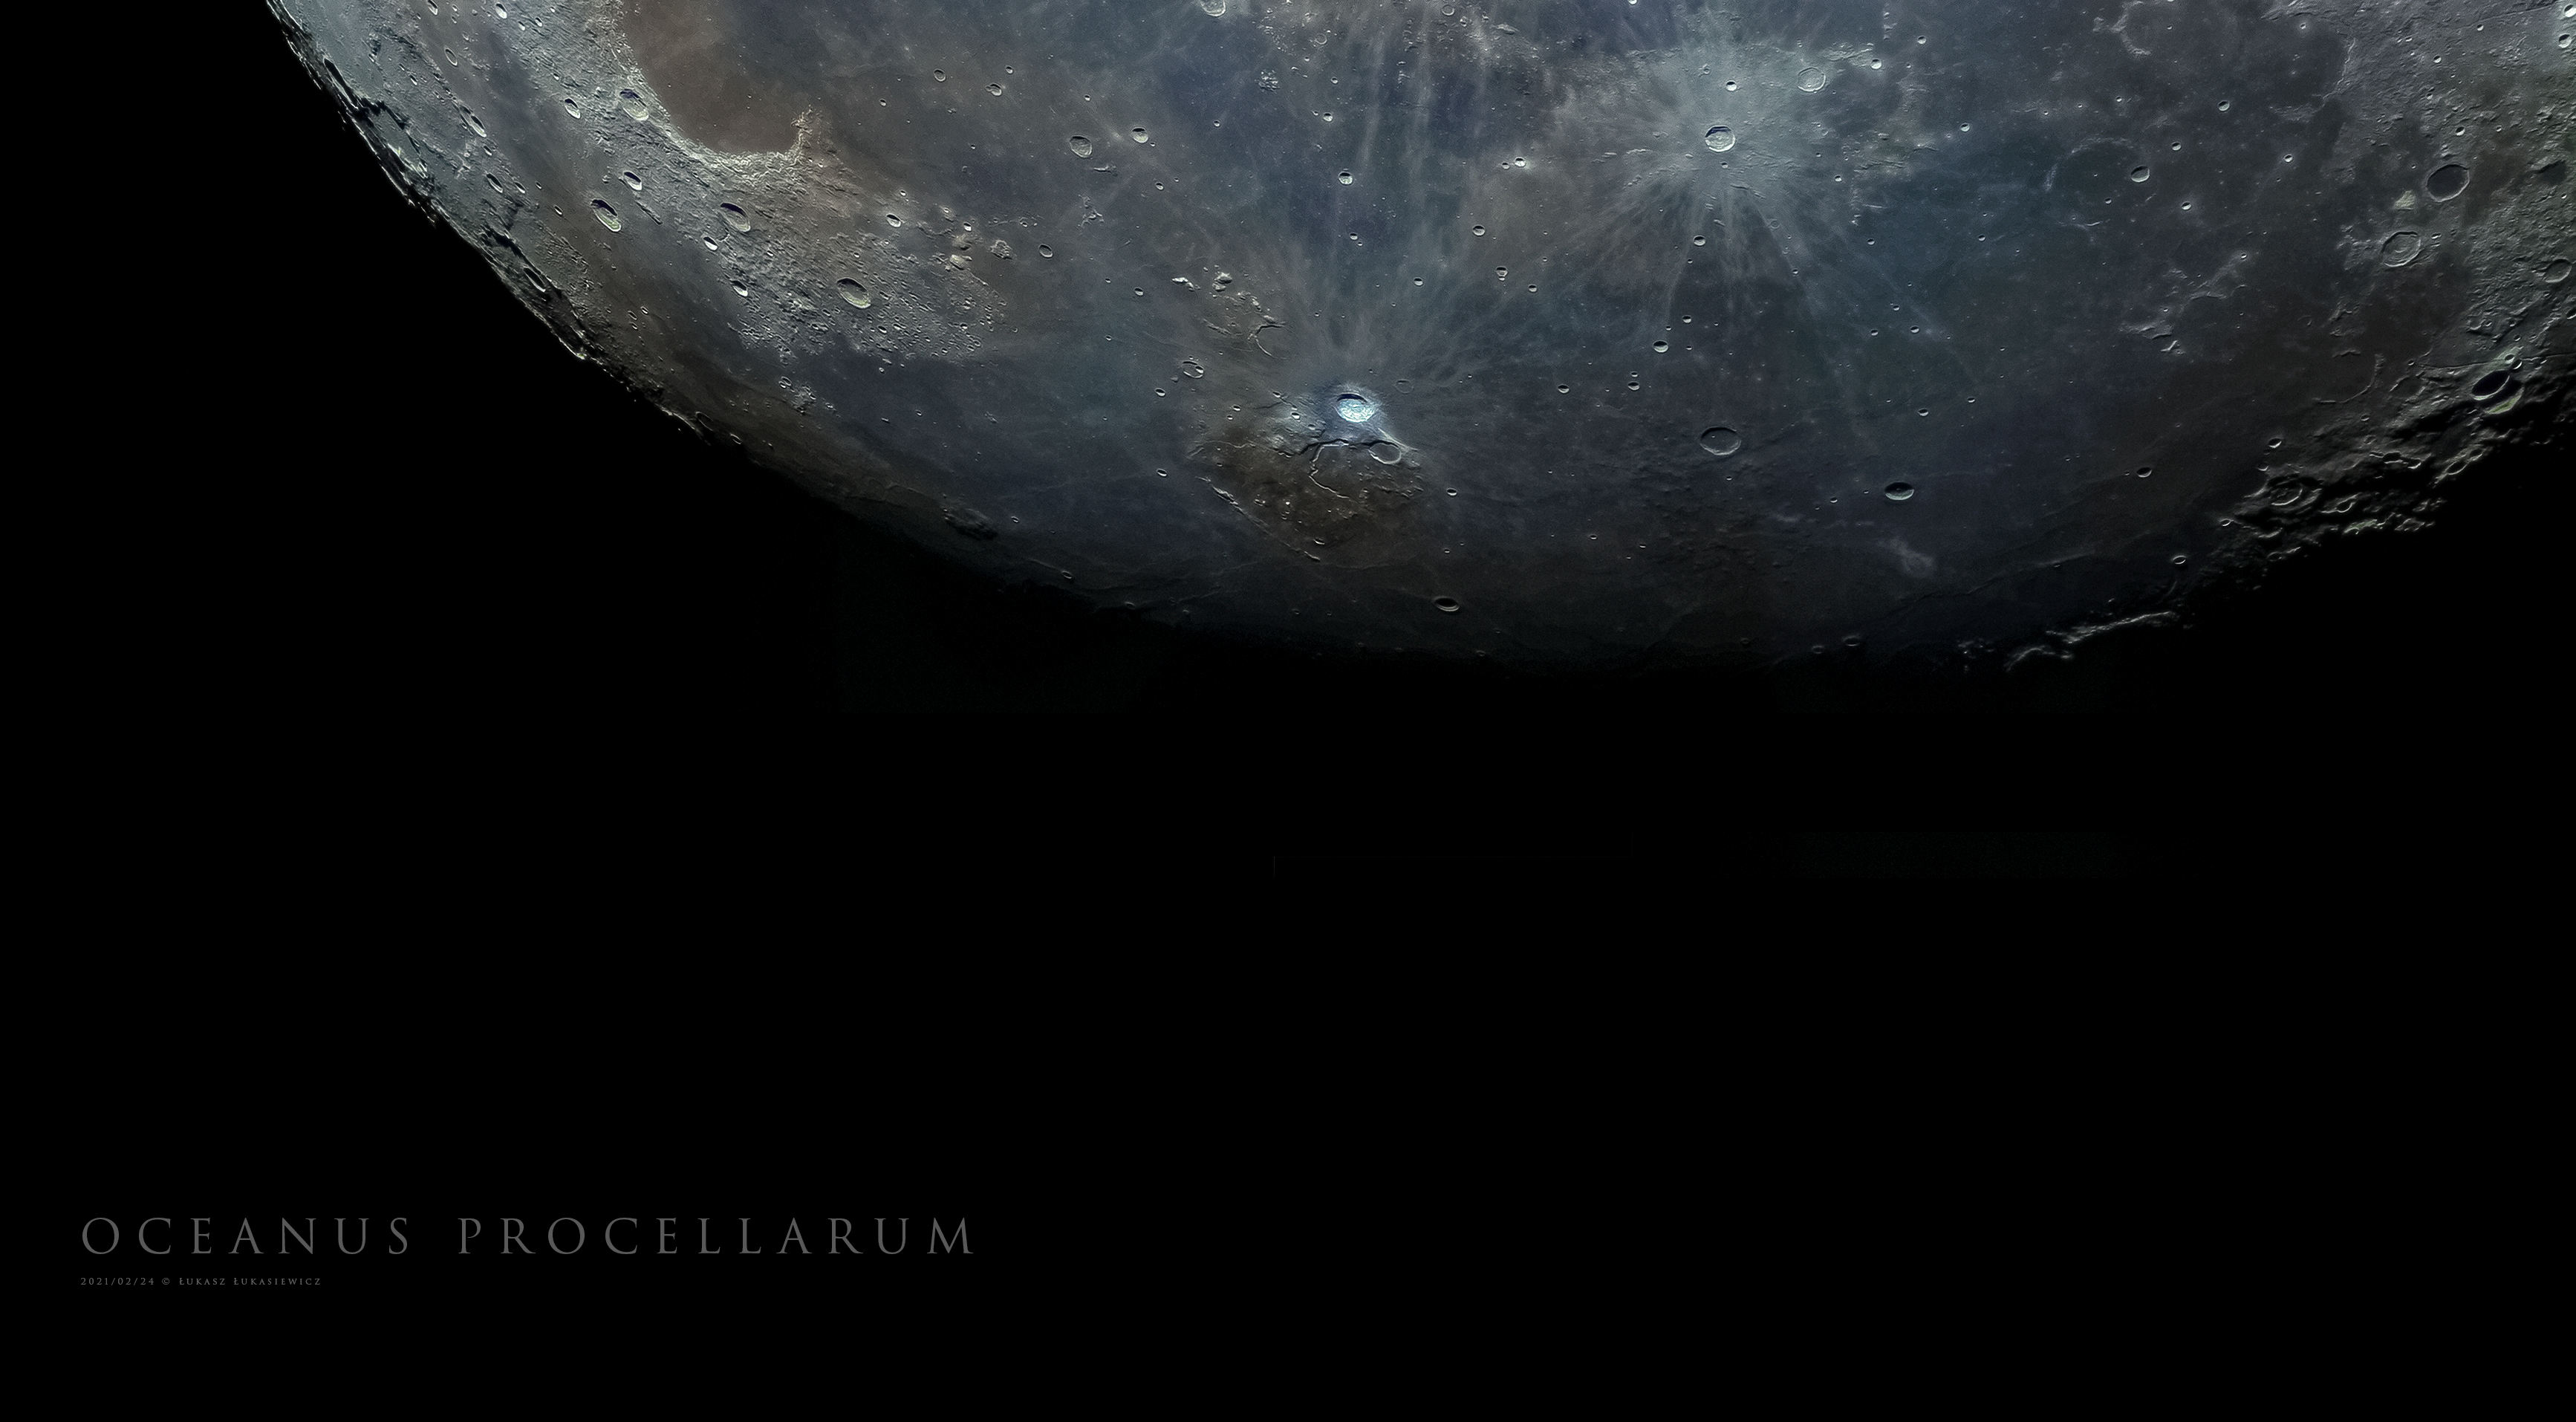 OCEANUS-PROCELLARUM-2021-02-24-80.jpg